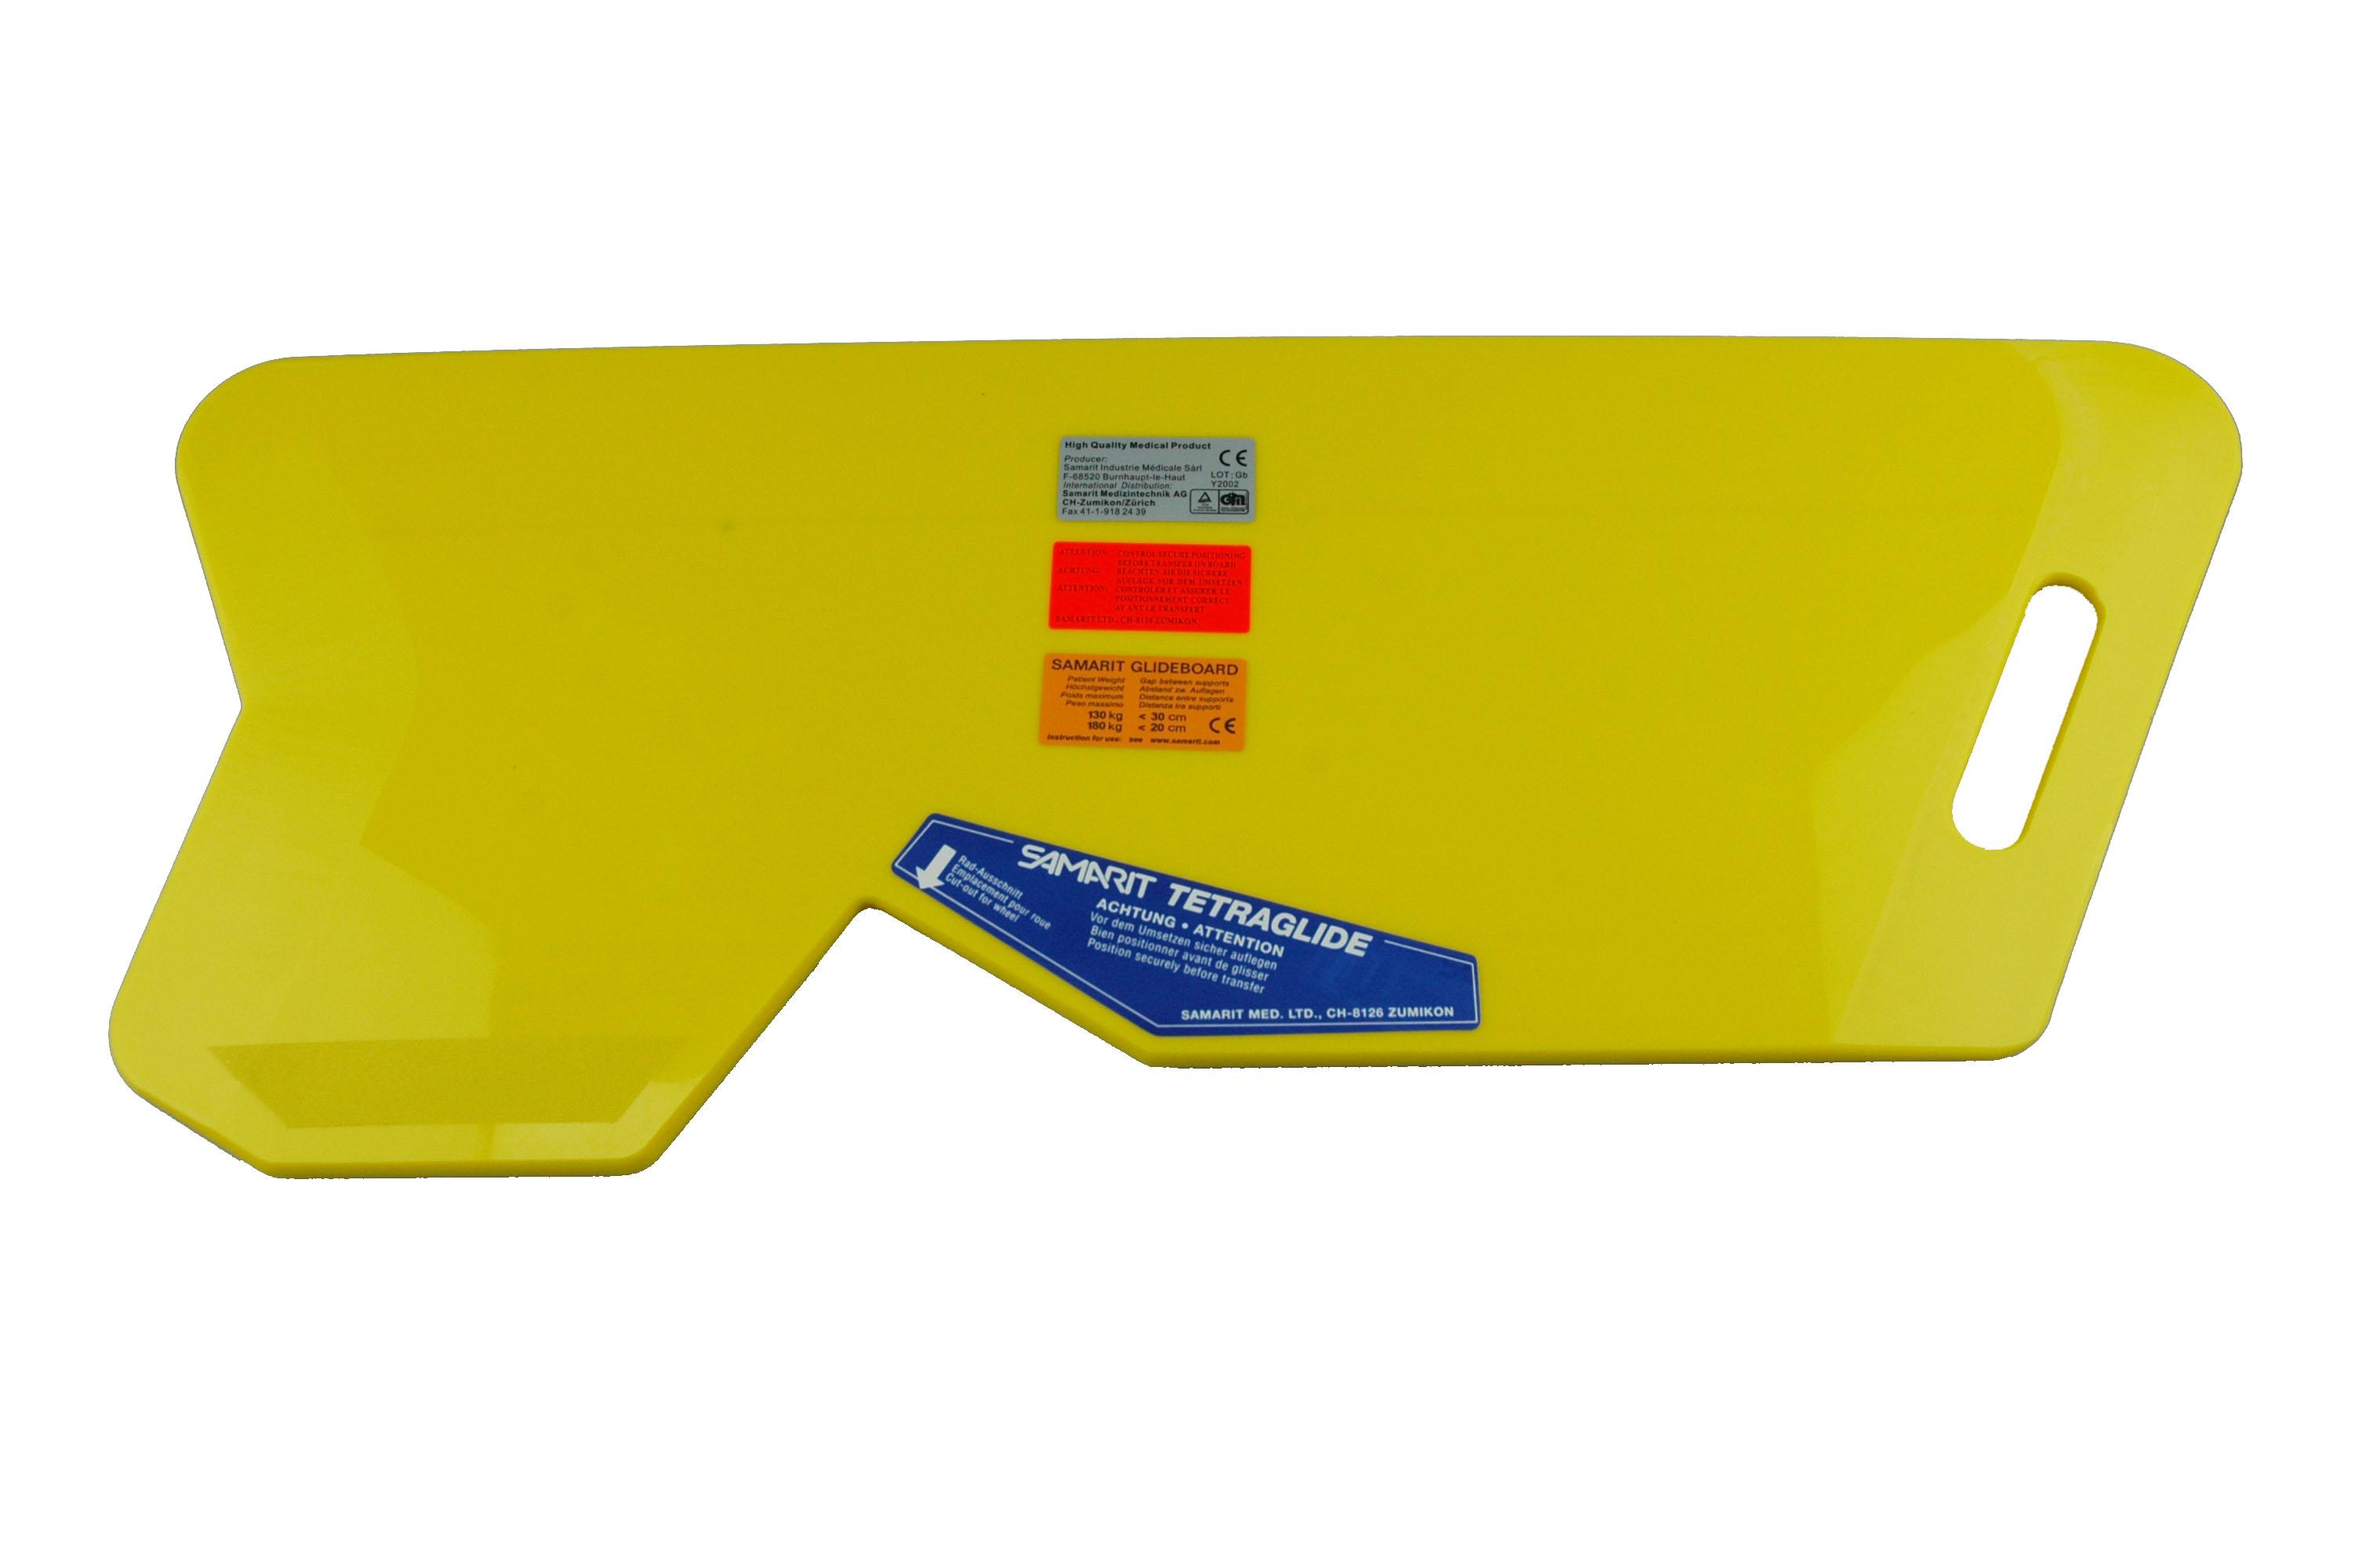 Tetraglide Sitting Transfer Board